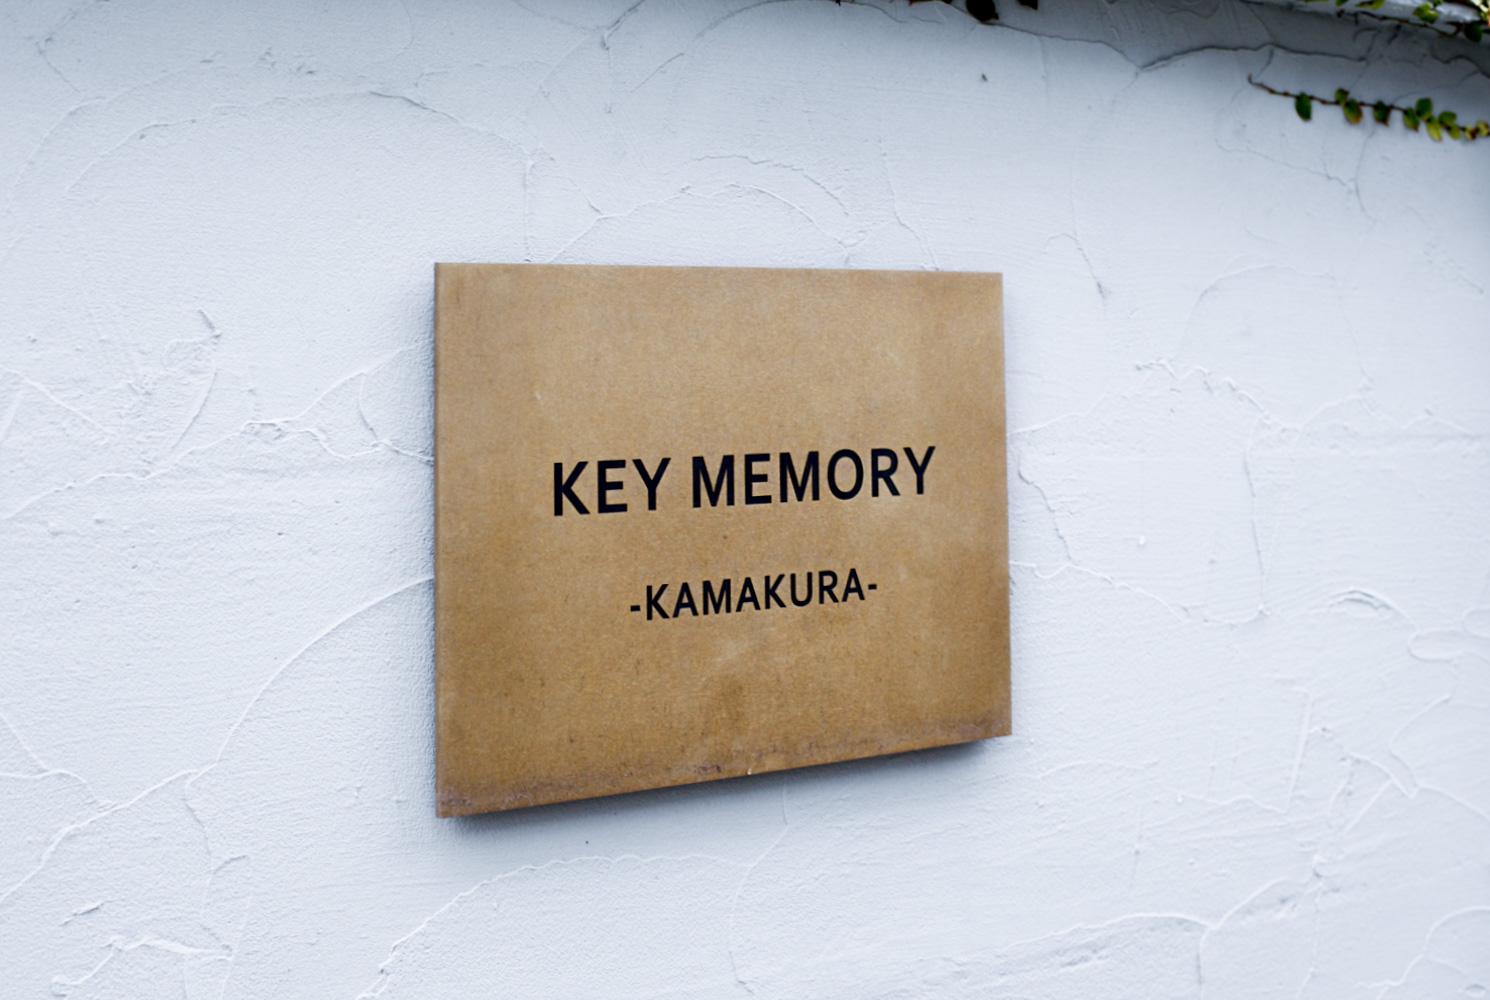 KEY MEMORY